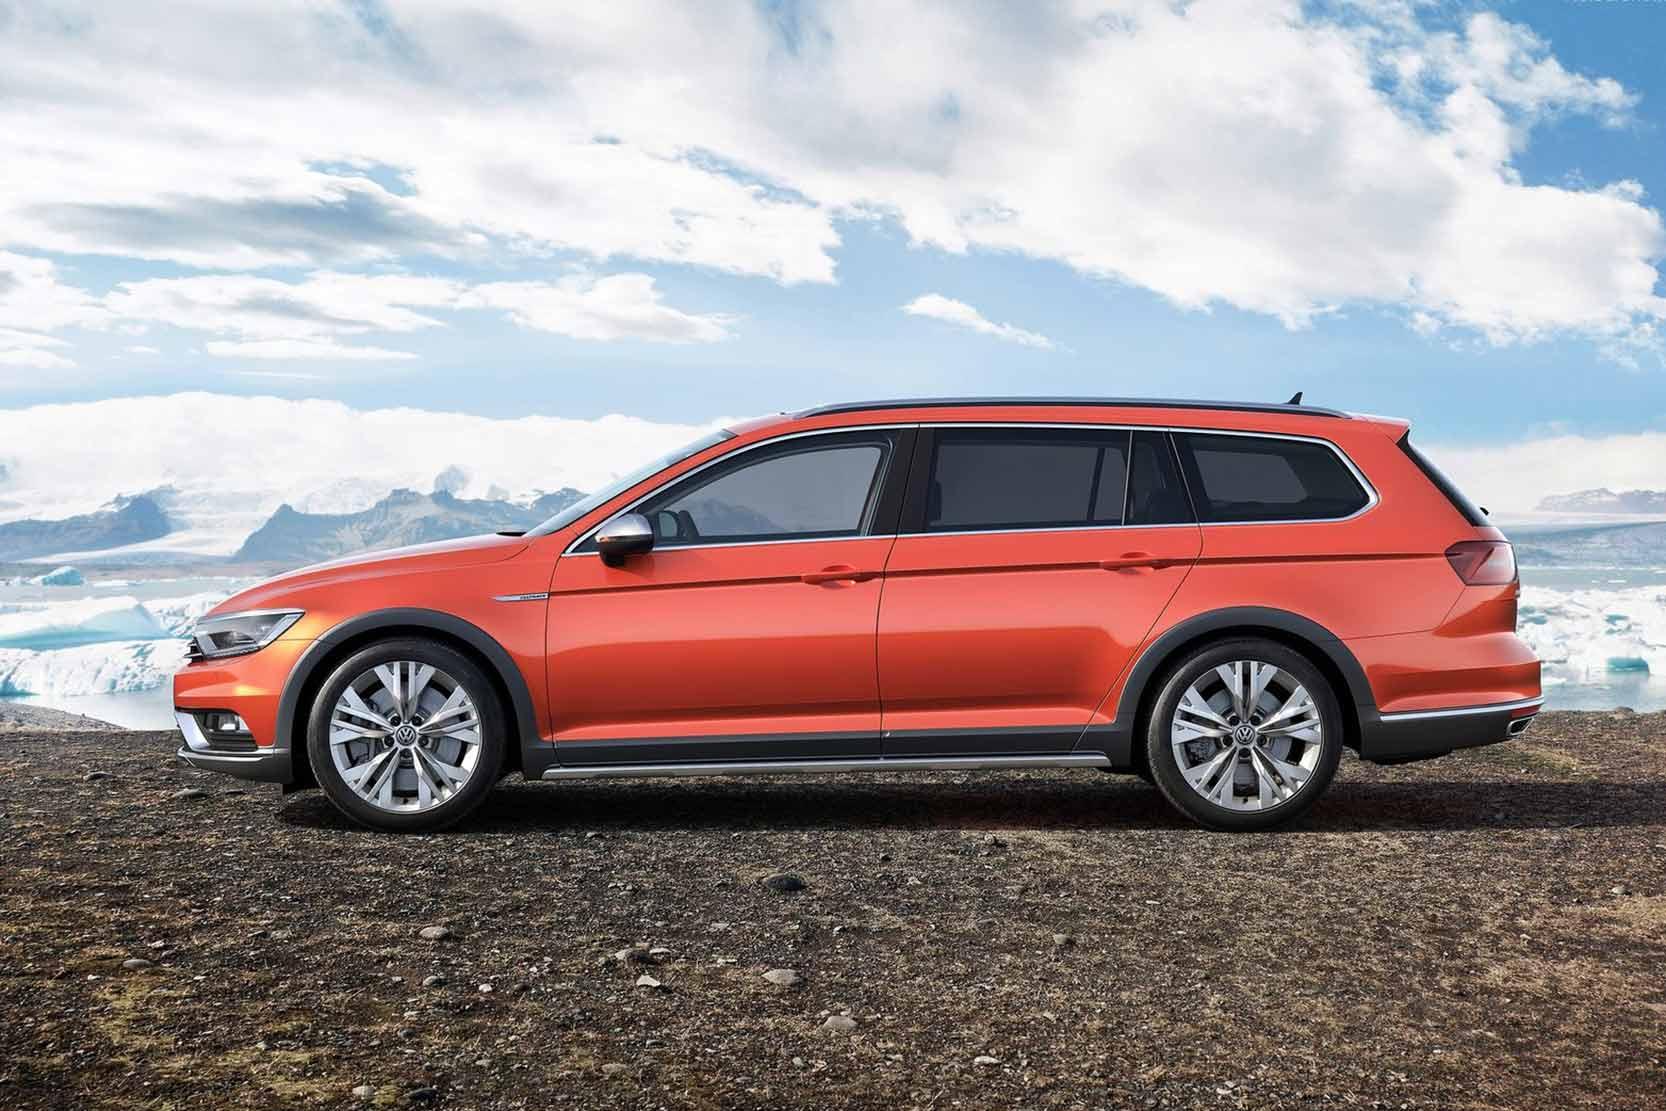 Fiche technique Volkswagen Passat Alltrack 2.0 TDI 190 2019